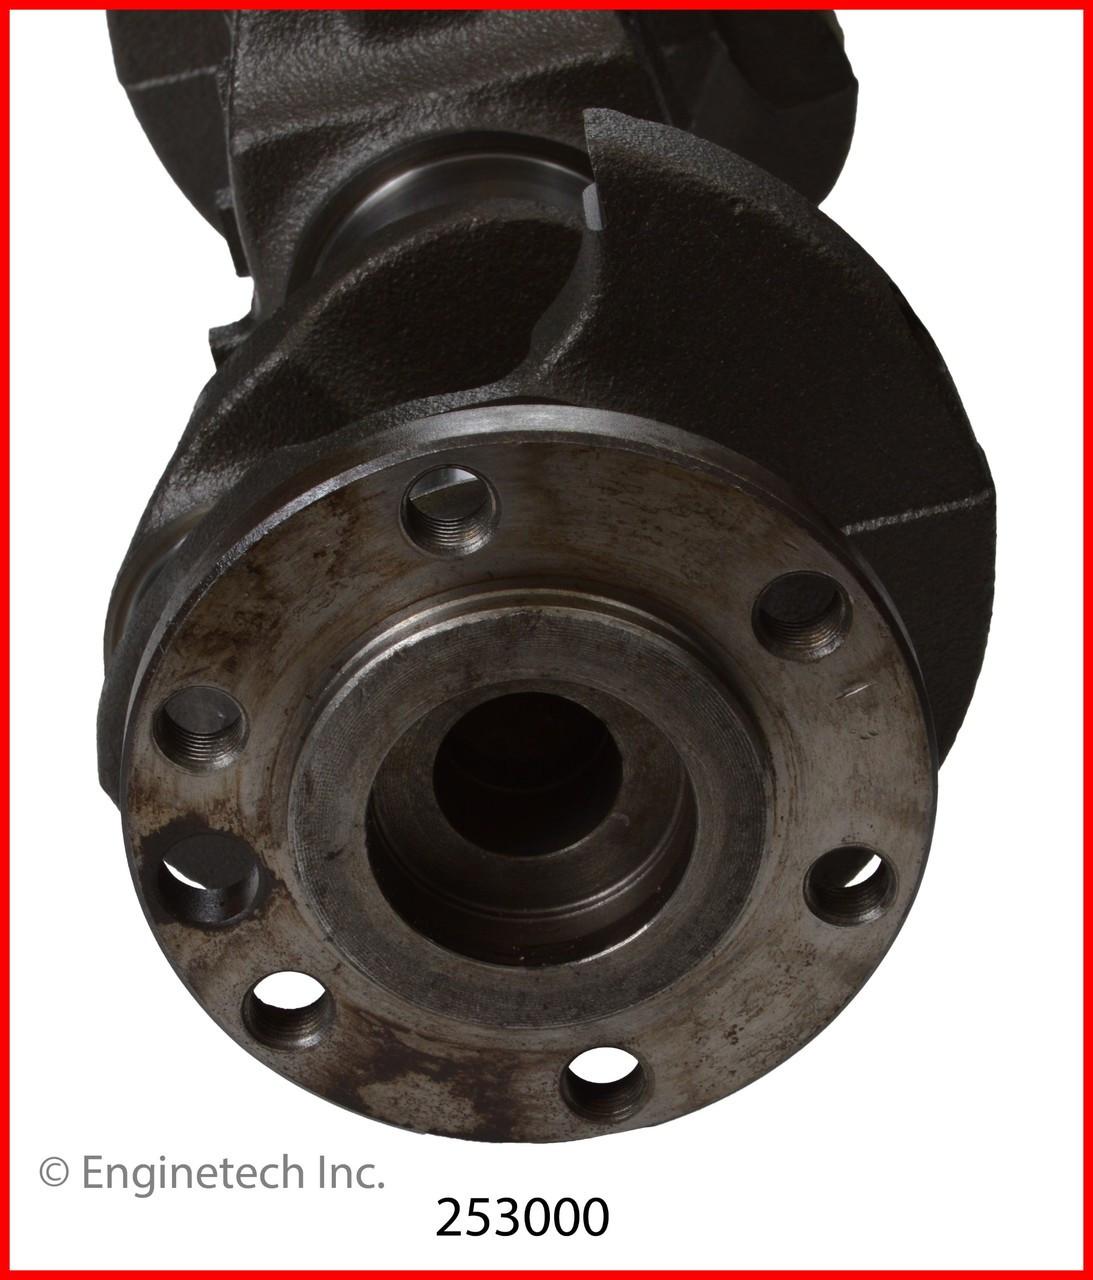 1988 American Motors Eagle 4.2L Engine Crankshaft Kit 253000 -4